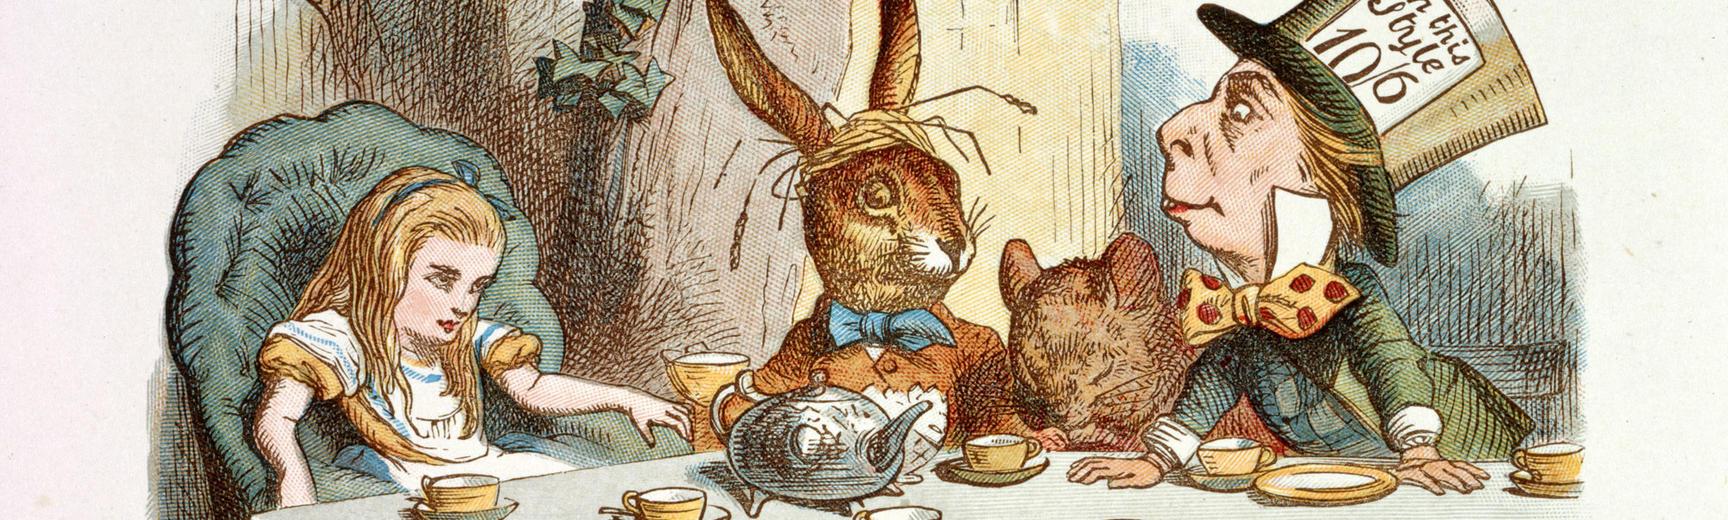 Alice in Wonderland – Mad Hatter's Tea Party